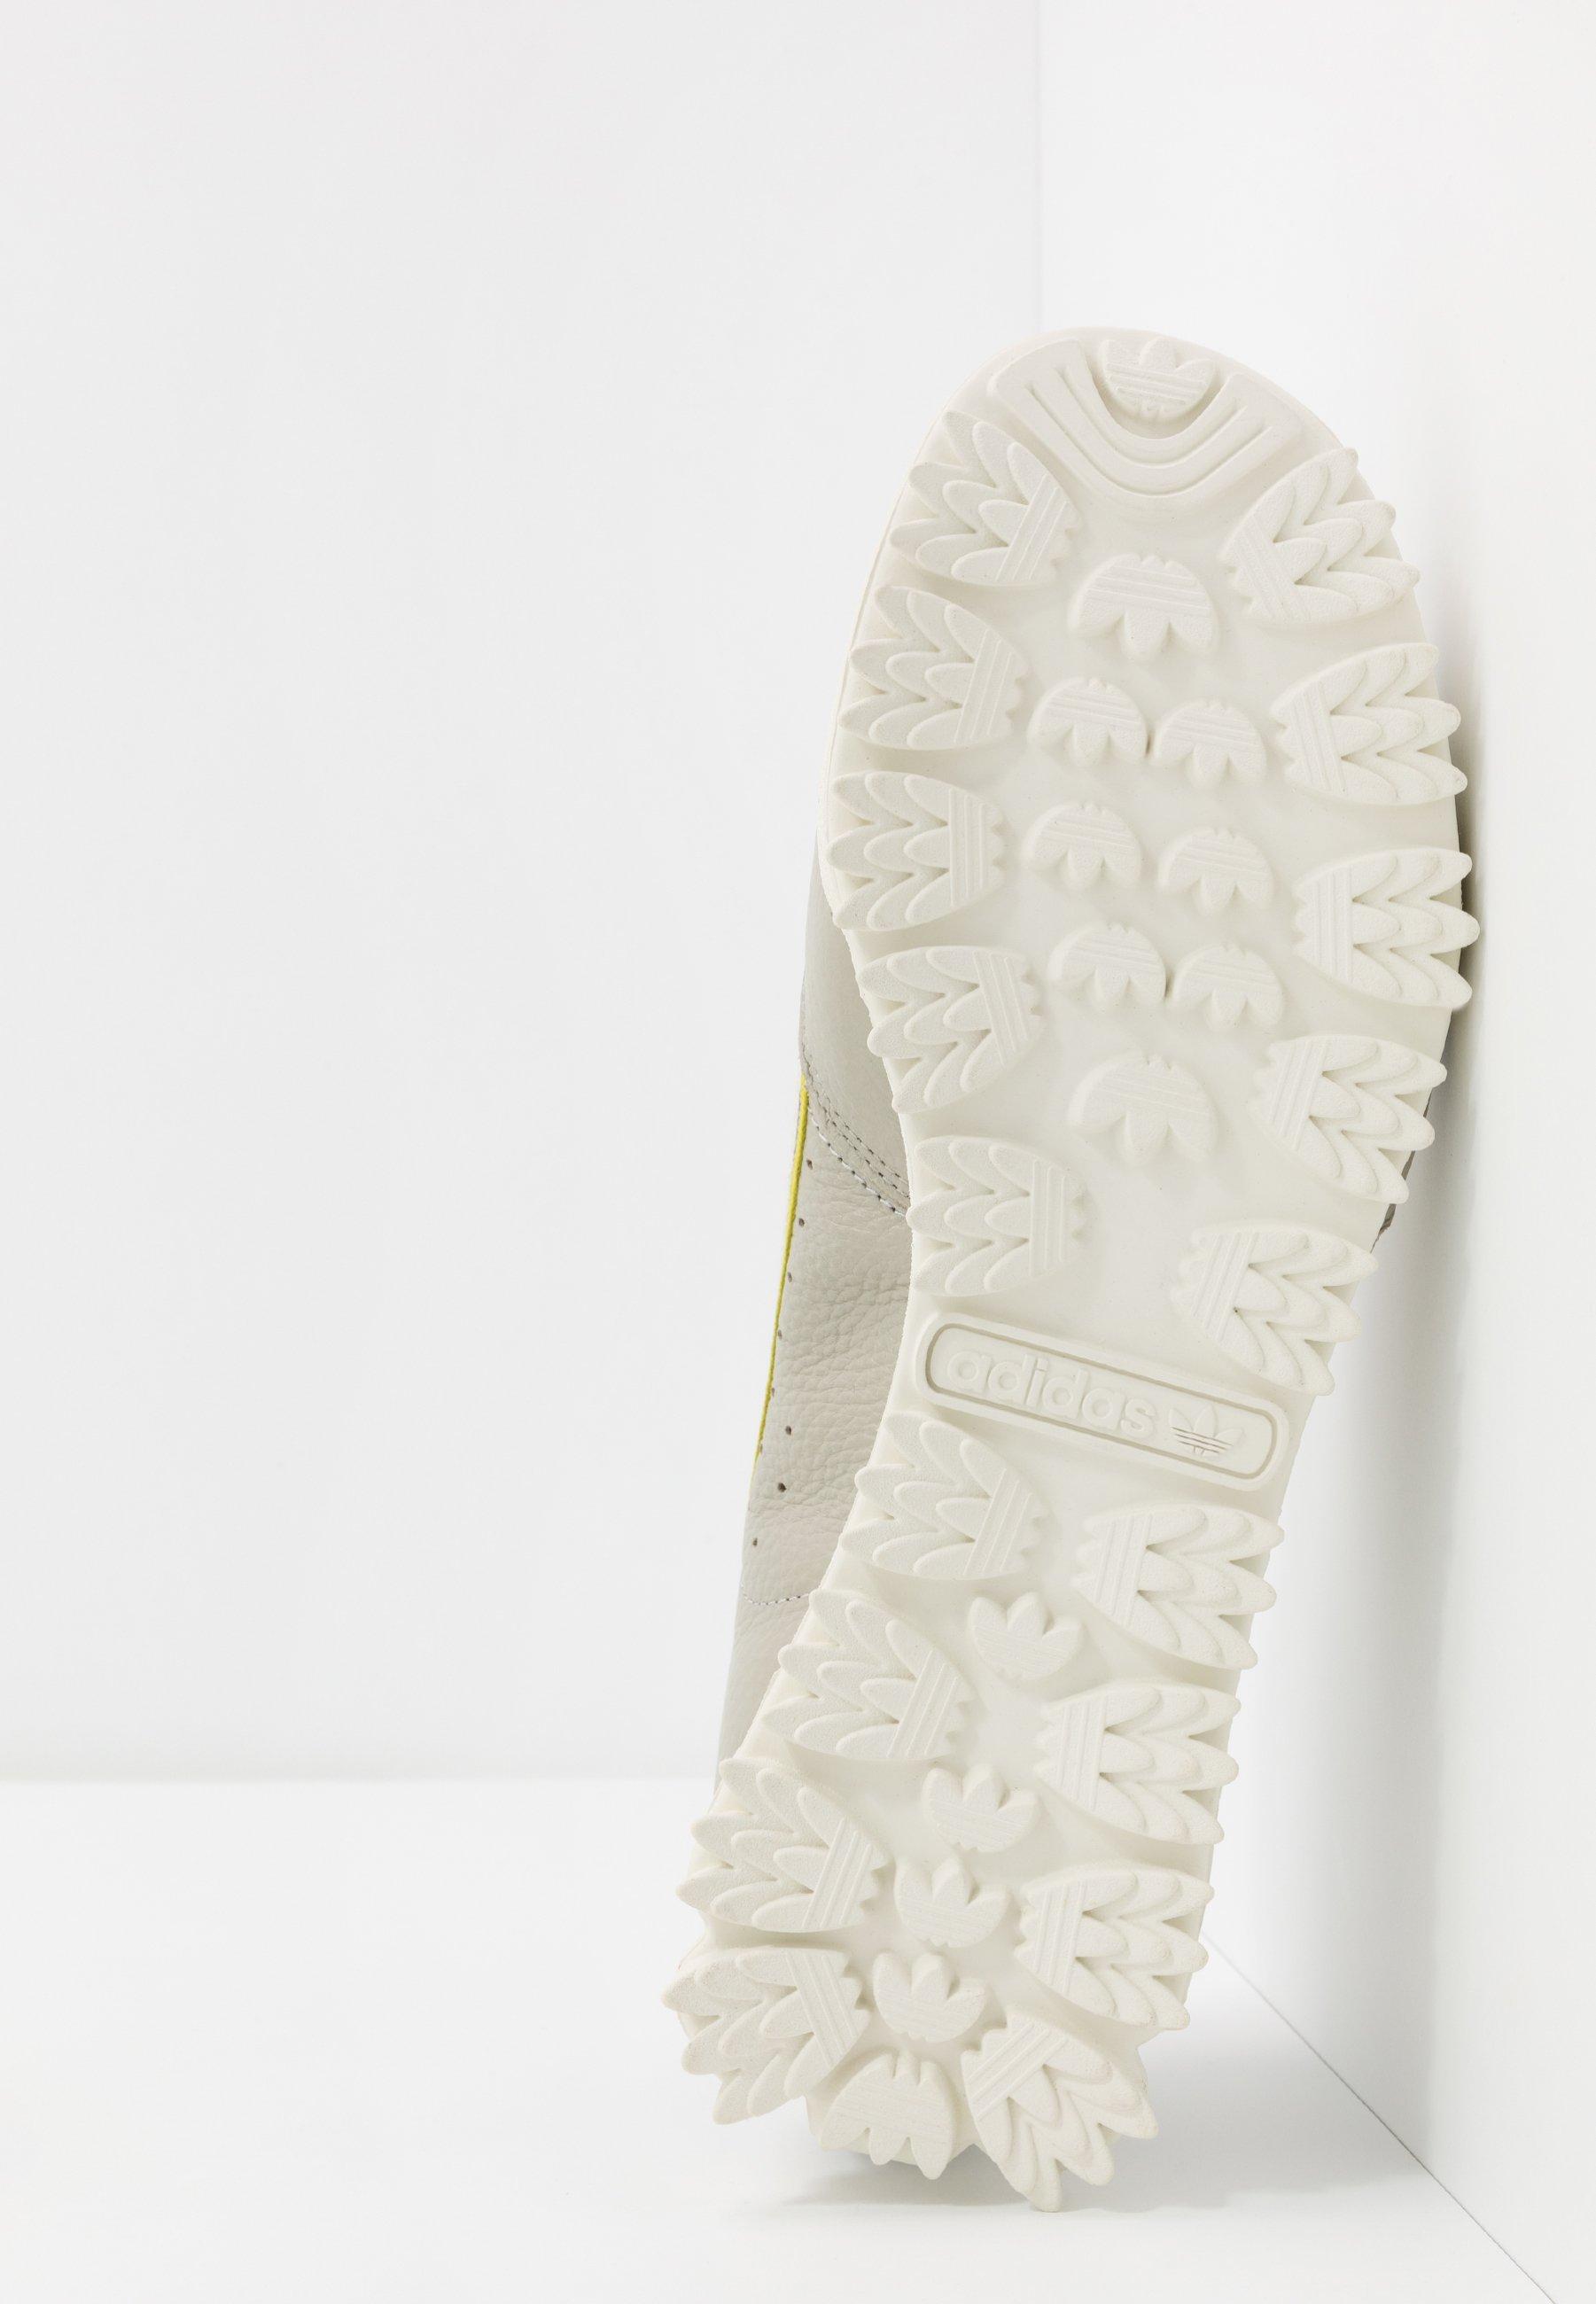 adidas Originals CONTINENTAL 80 BAARA - Baskets basses - sesame/orbit grey /core black